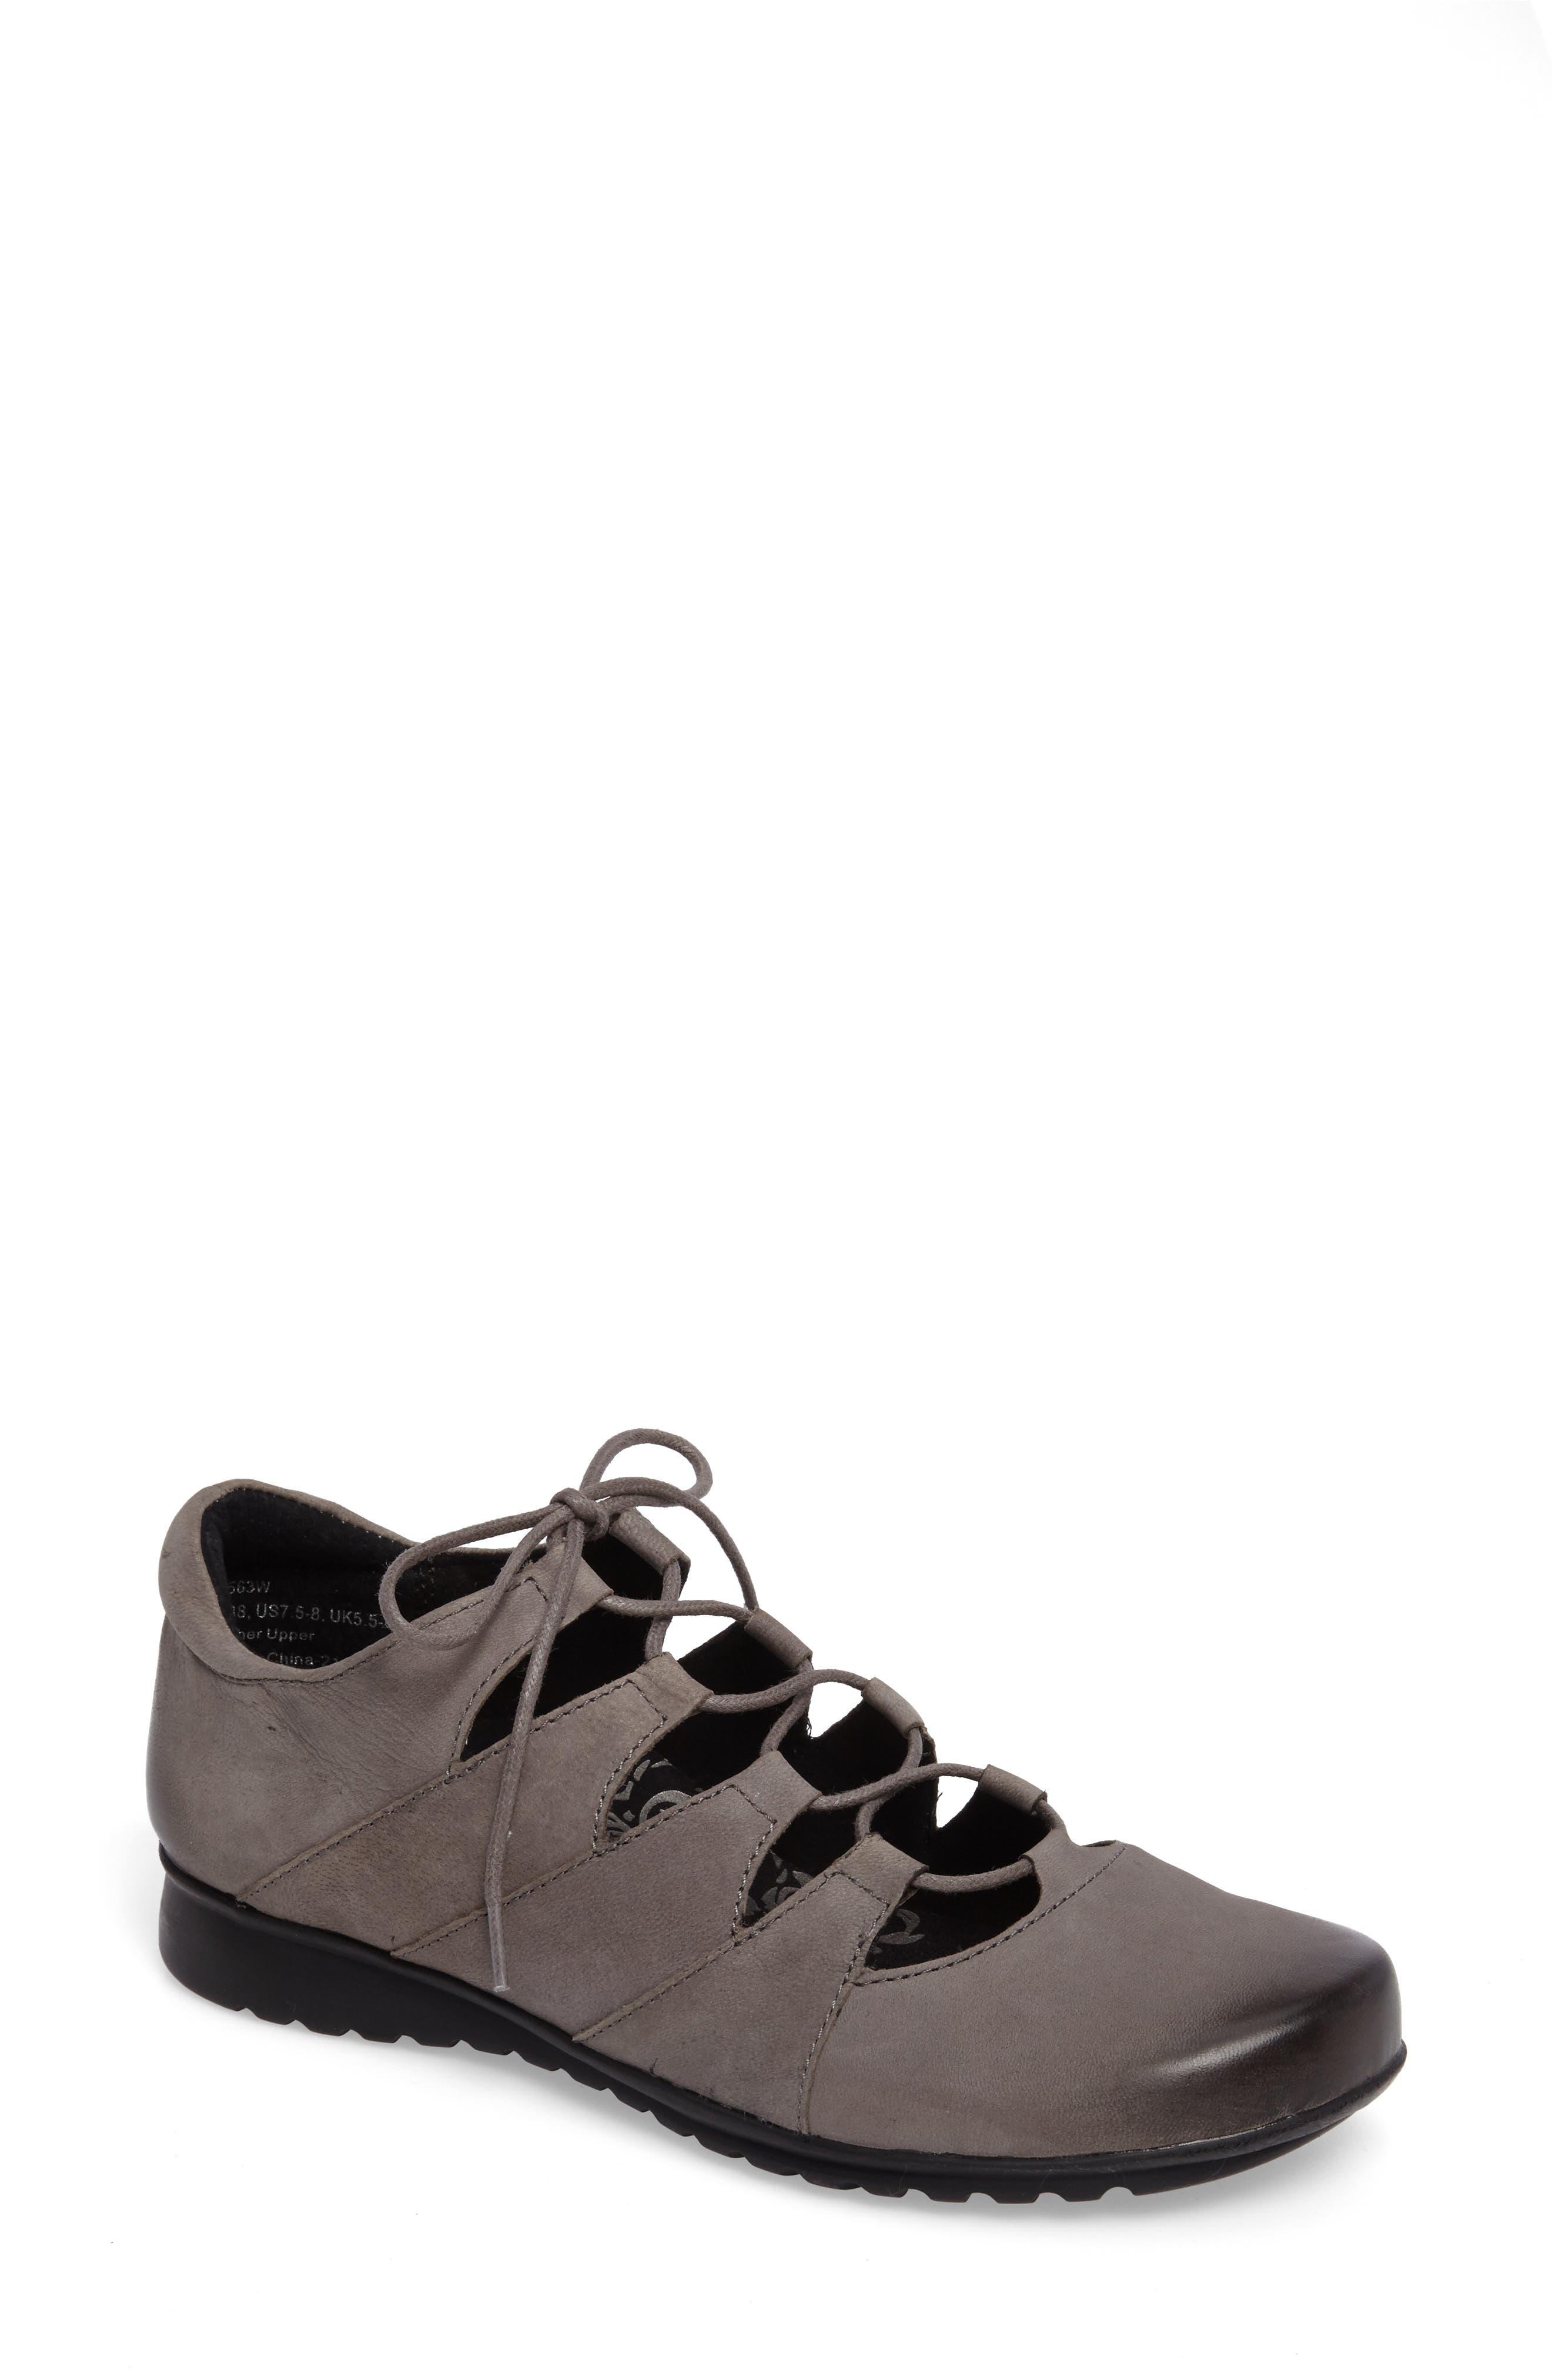 Aetrex Sienna Cutout Sneaker - Grey